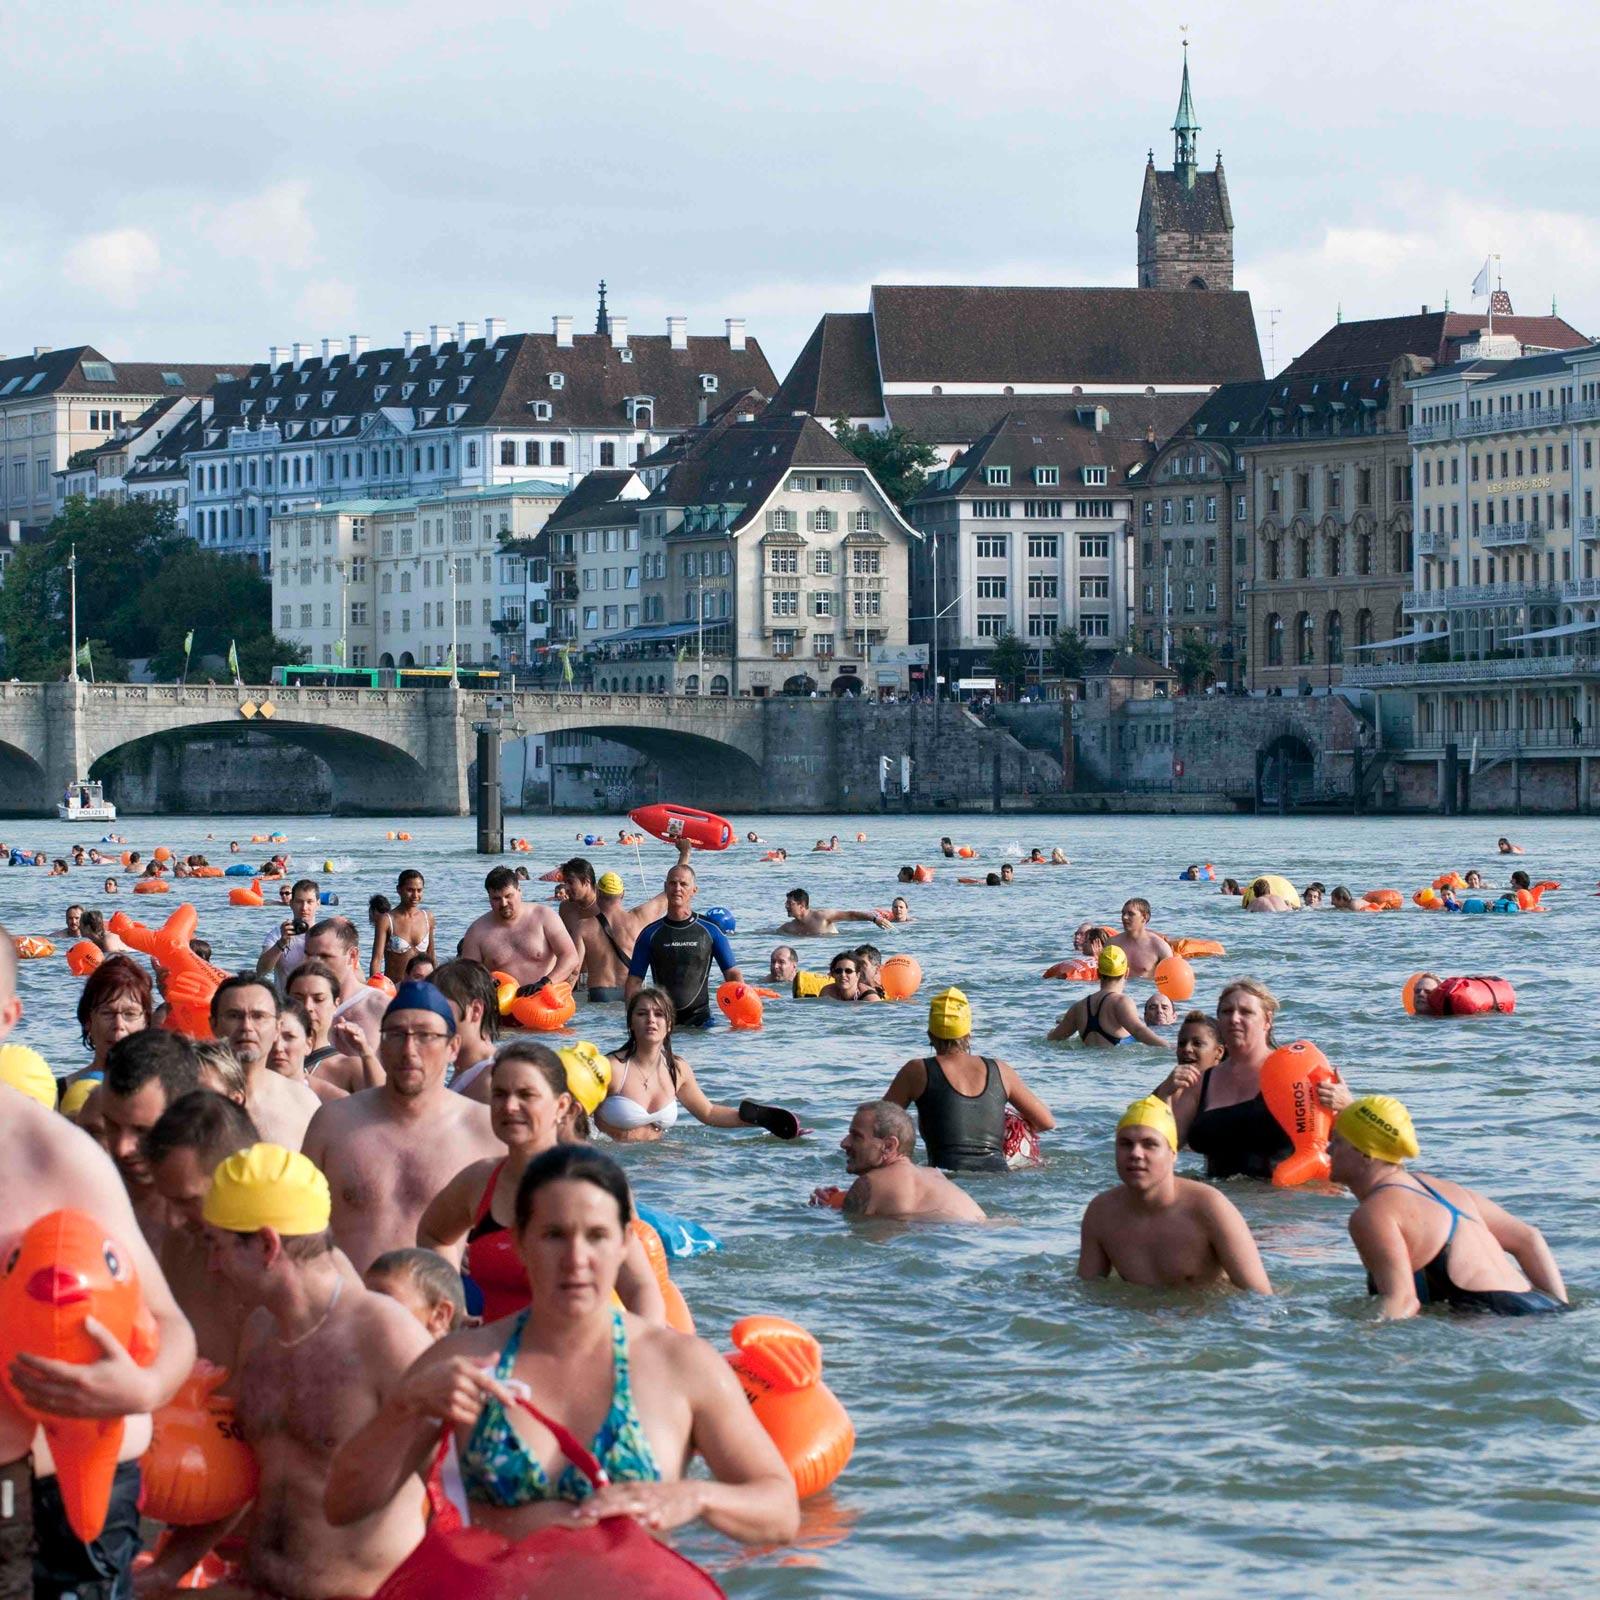 In Basel you can swim in the Rhine river on own responsibility / A Bâle, vous pouvez nager dans le Rhin sous votre propre responsabilité / In Basel kun je op eigen verantwoordelijkheid in de rivier de Rijn zwemmen.